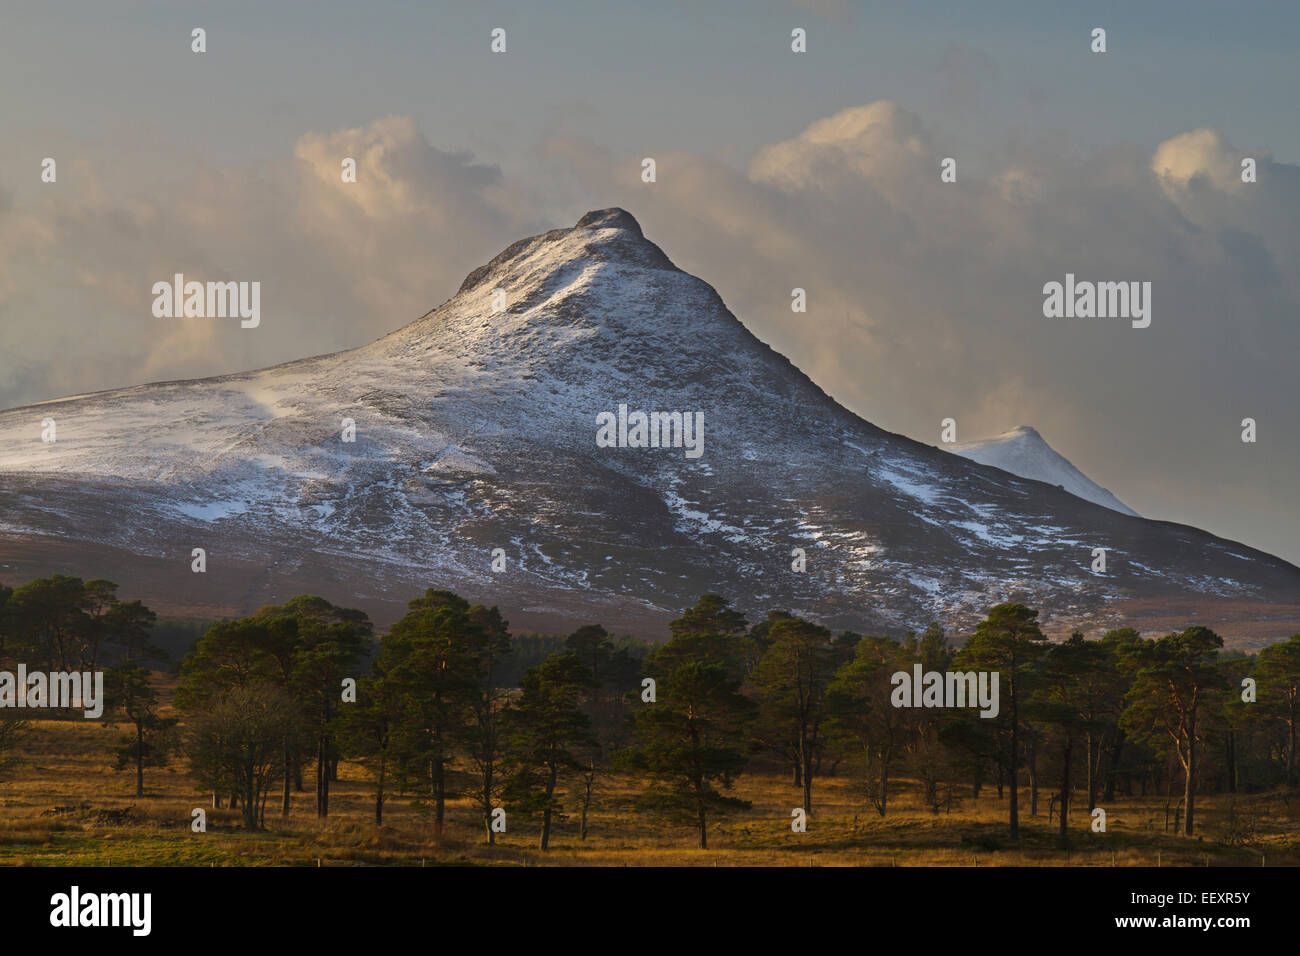 Caithness, Maiden Pap mountain - Stock Image